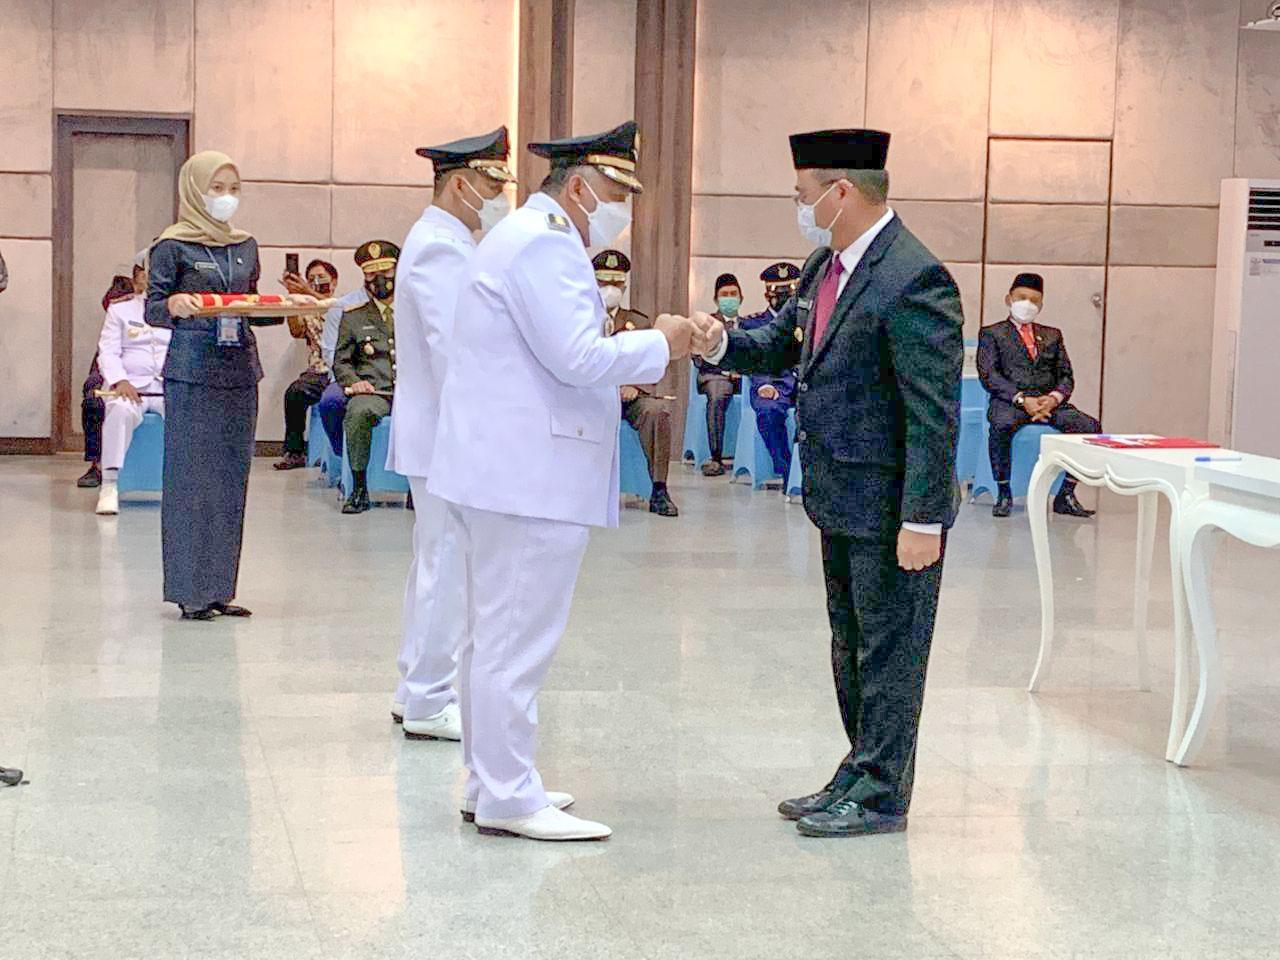 Gubernur Erzaldi Lantik Bupati dan Wakil Bupati Bangka Barat